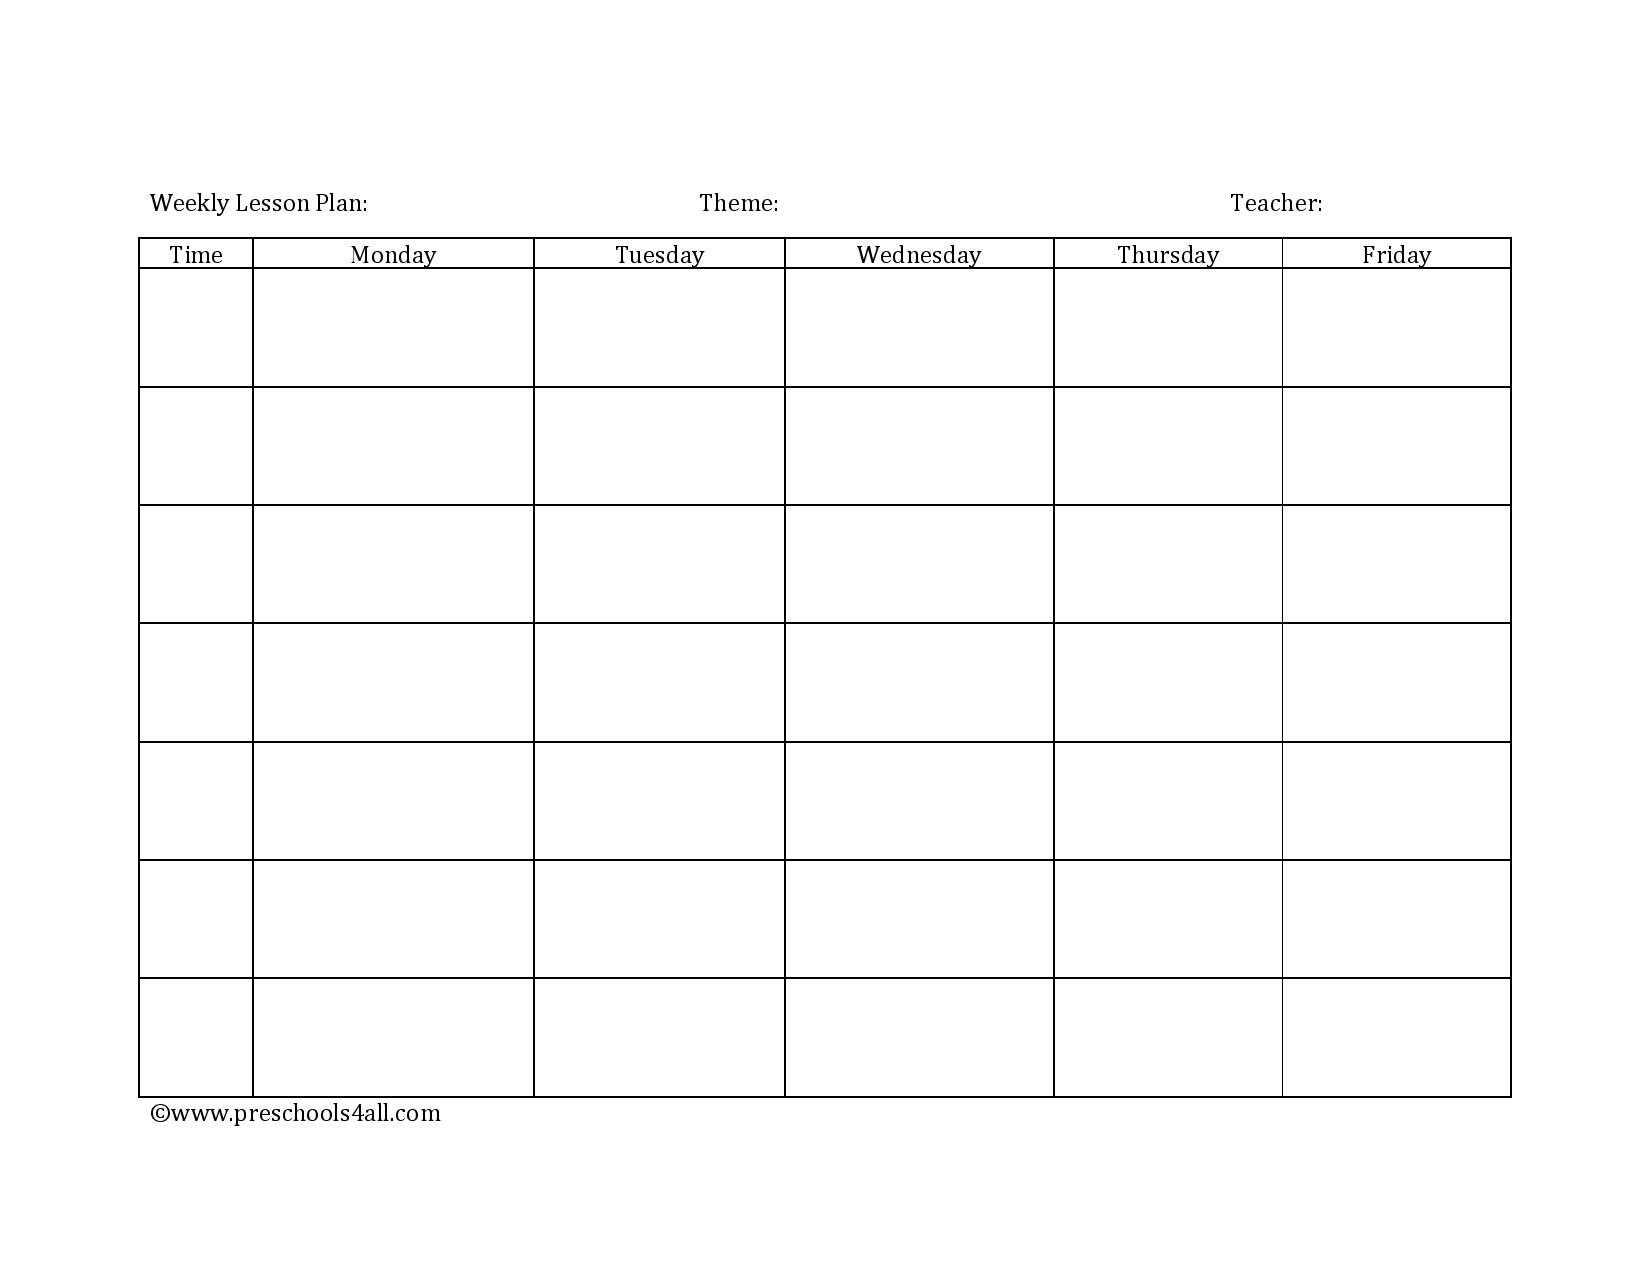 Preschool Lesson Plan Template - Lesson Plan Book Template Pertaining To Teacher Plan Book Template Word